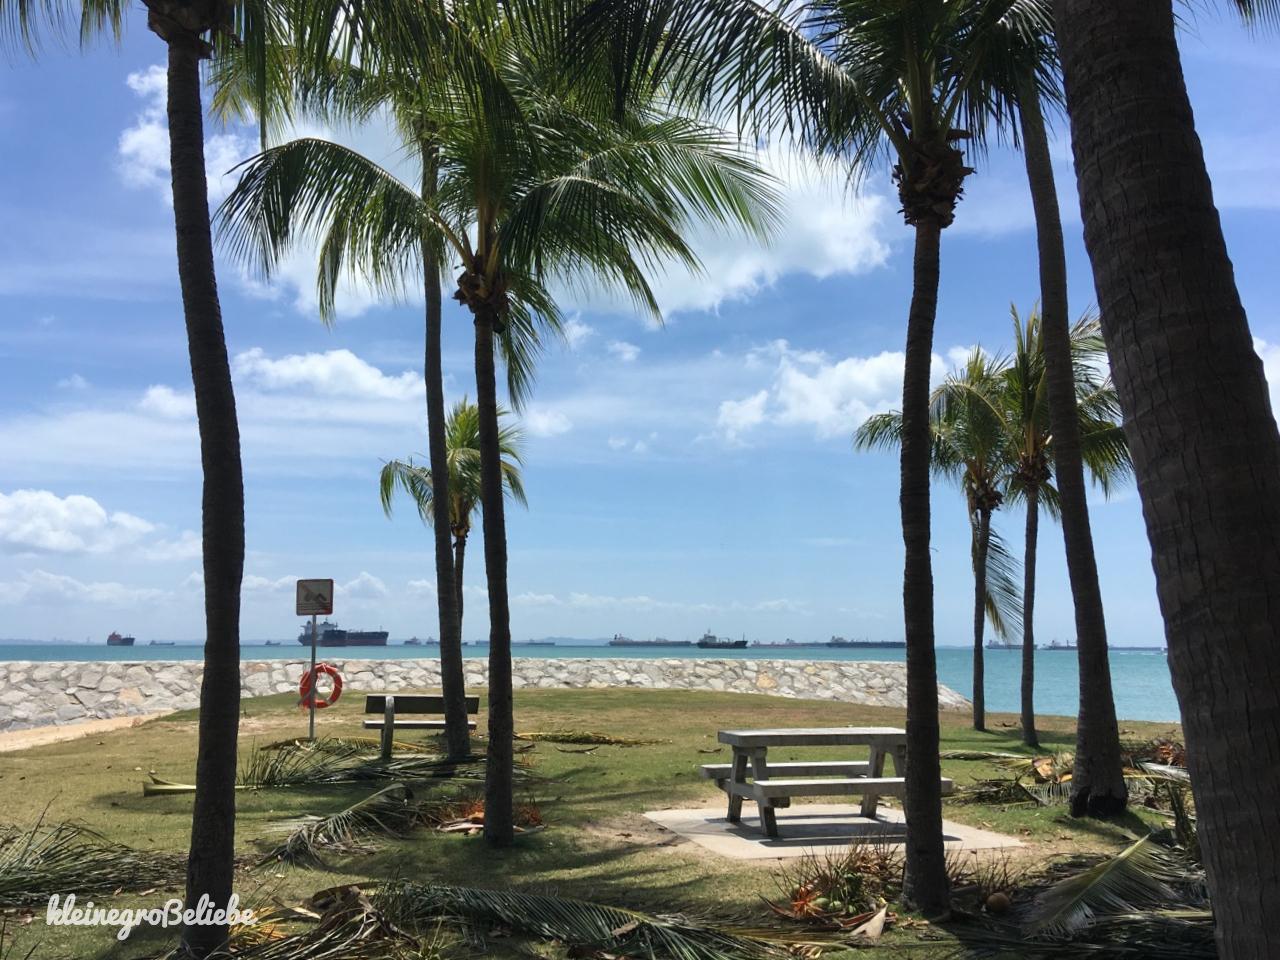 Singapur - East Coast Park Palme